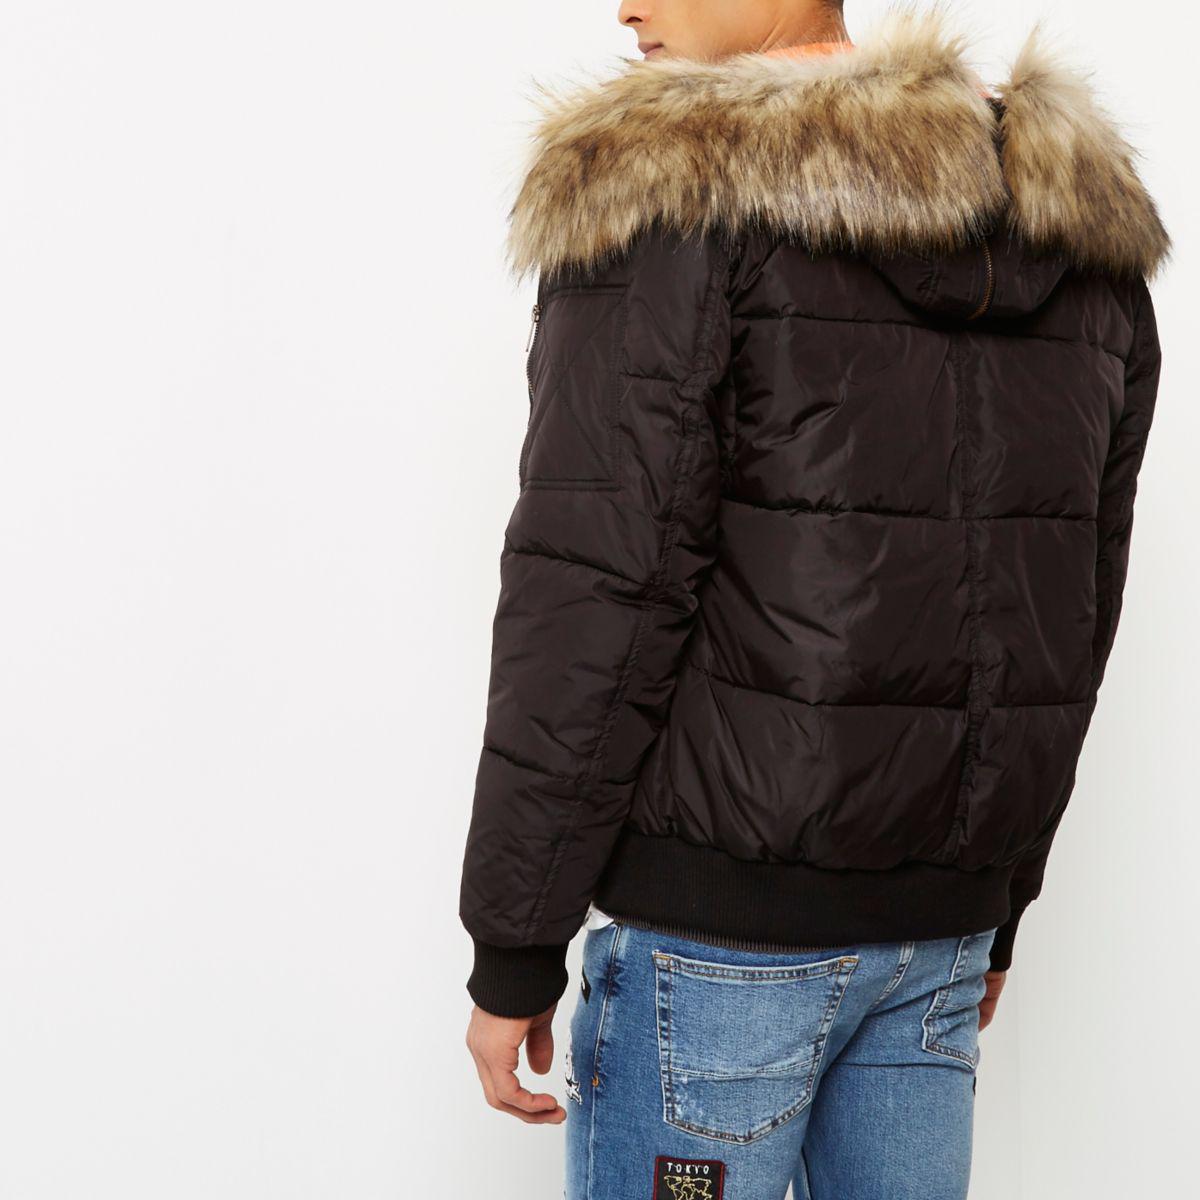 e28353ddd43e Lyst - River Island Faux Fur Trim Hooded Puffer Jacket in Black for Men